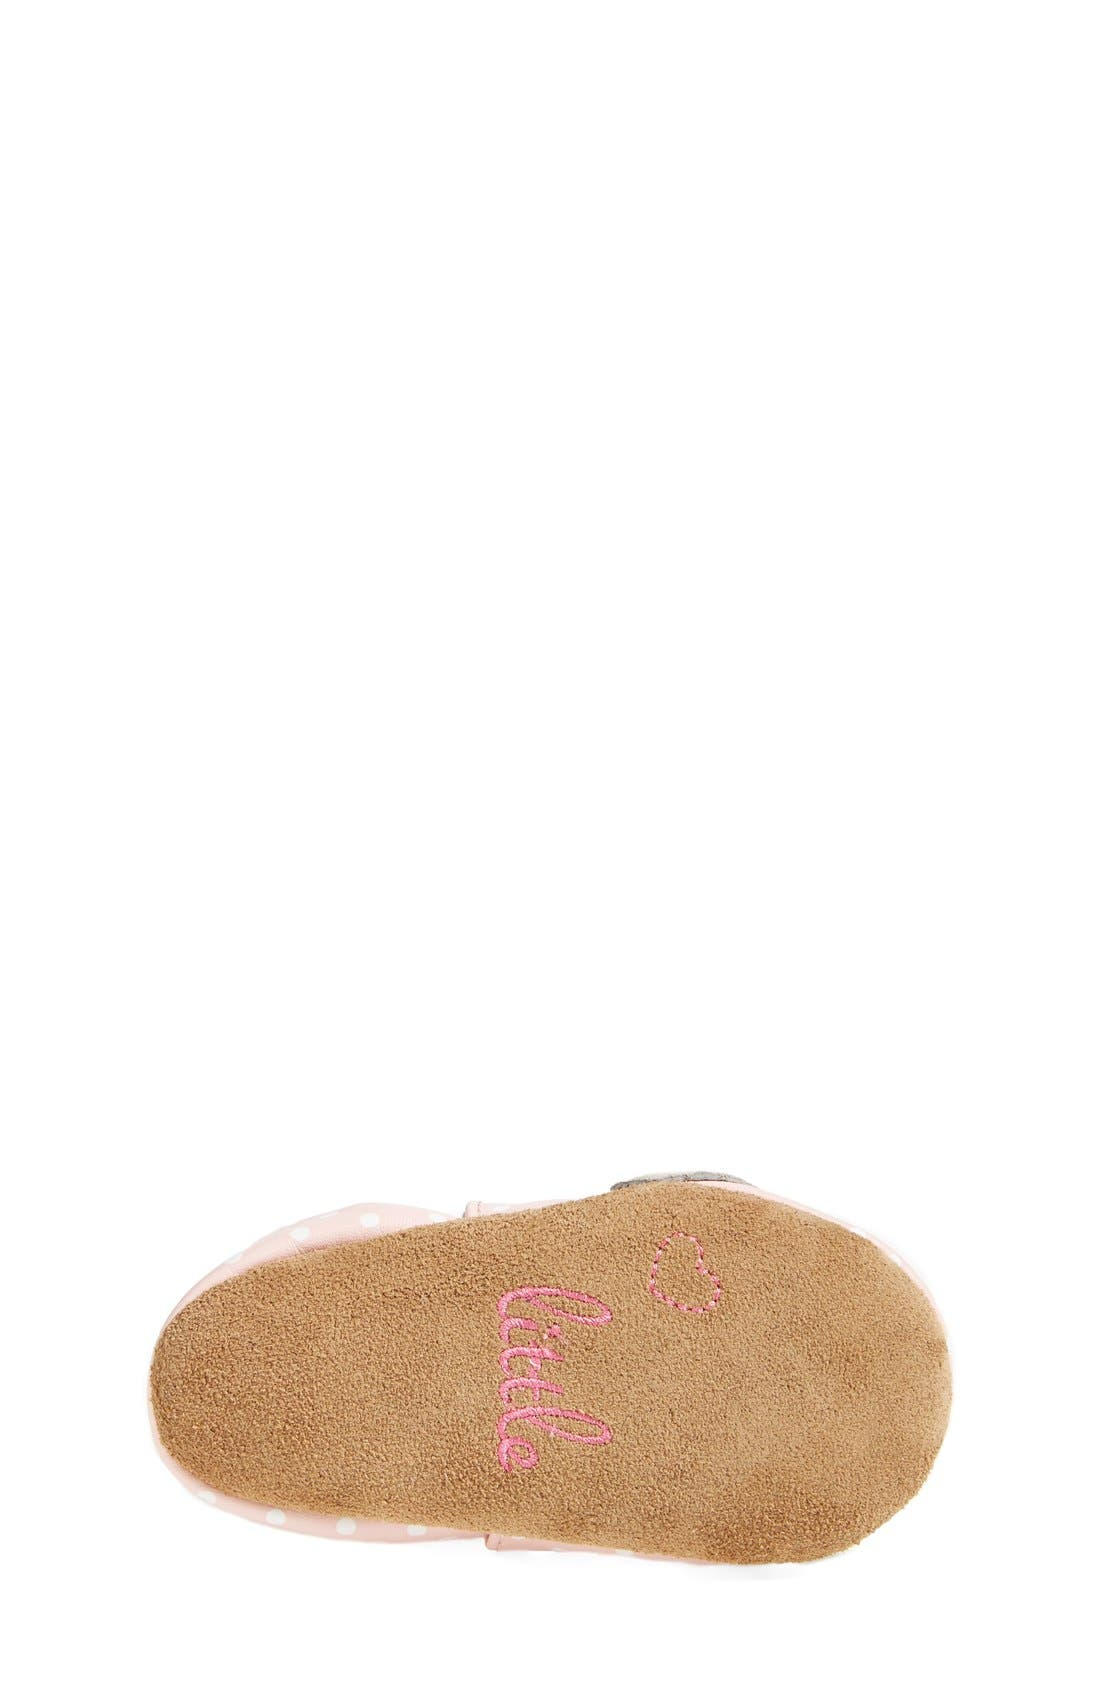 'Little Peanut' Crib Shoe,                             Alternate thumbnail 4, color,                             PASTEL PINK